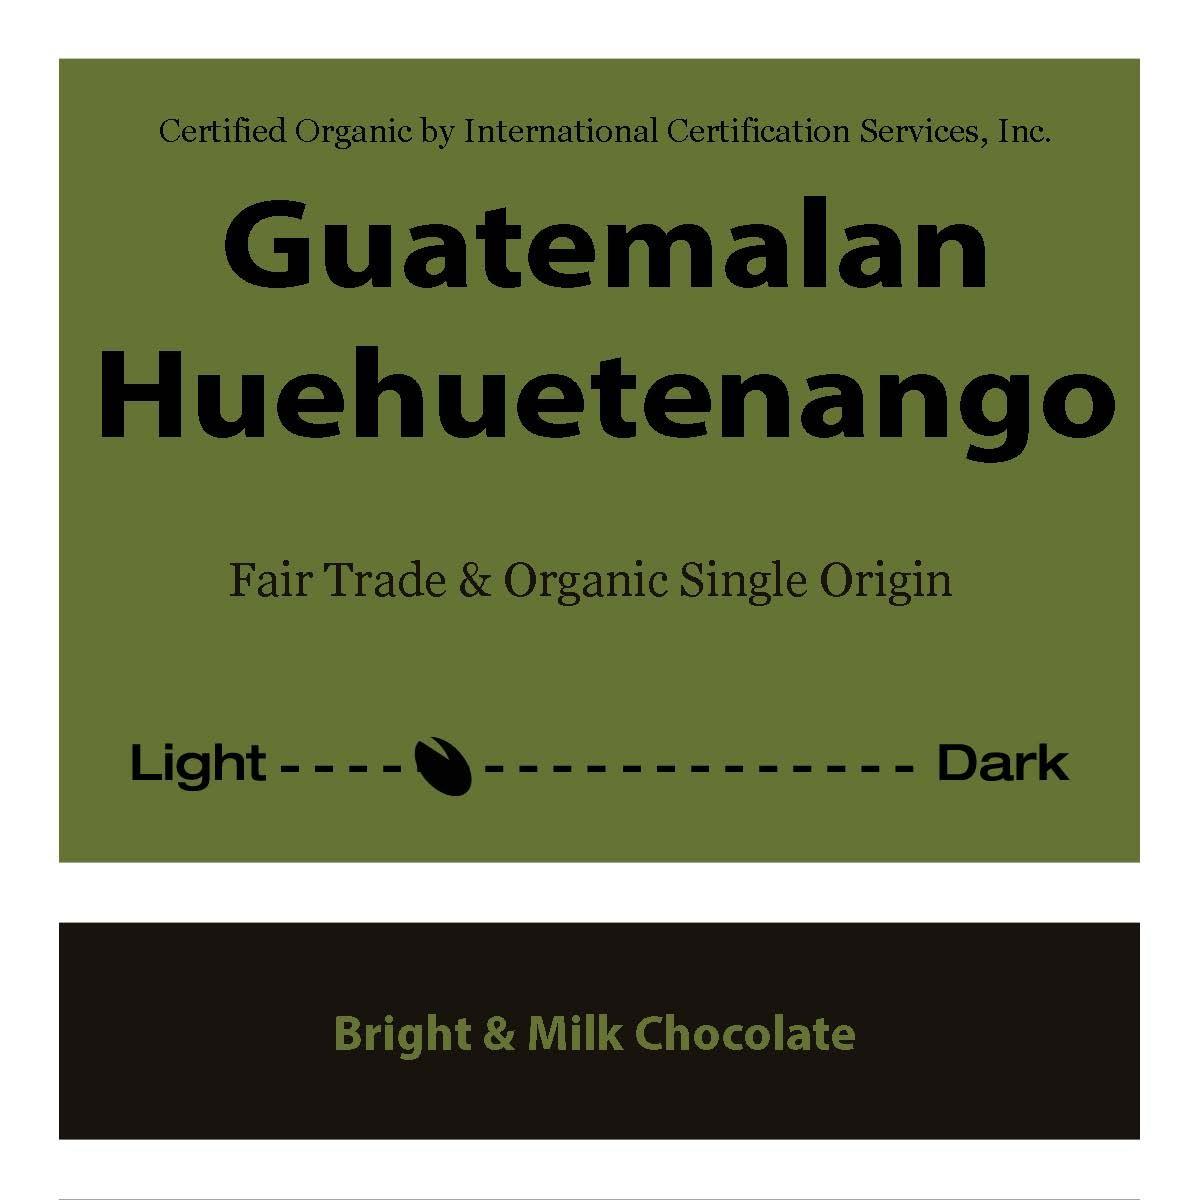 Guatemalan Huehuetenango